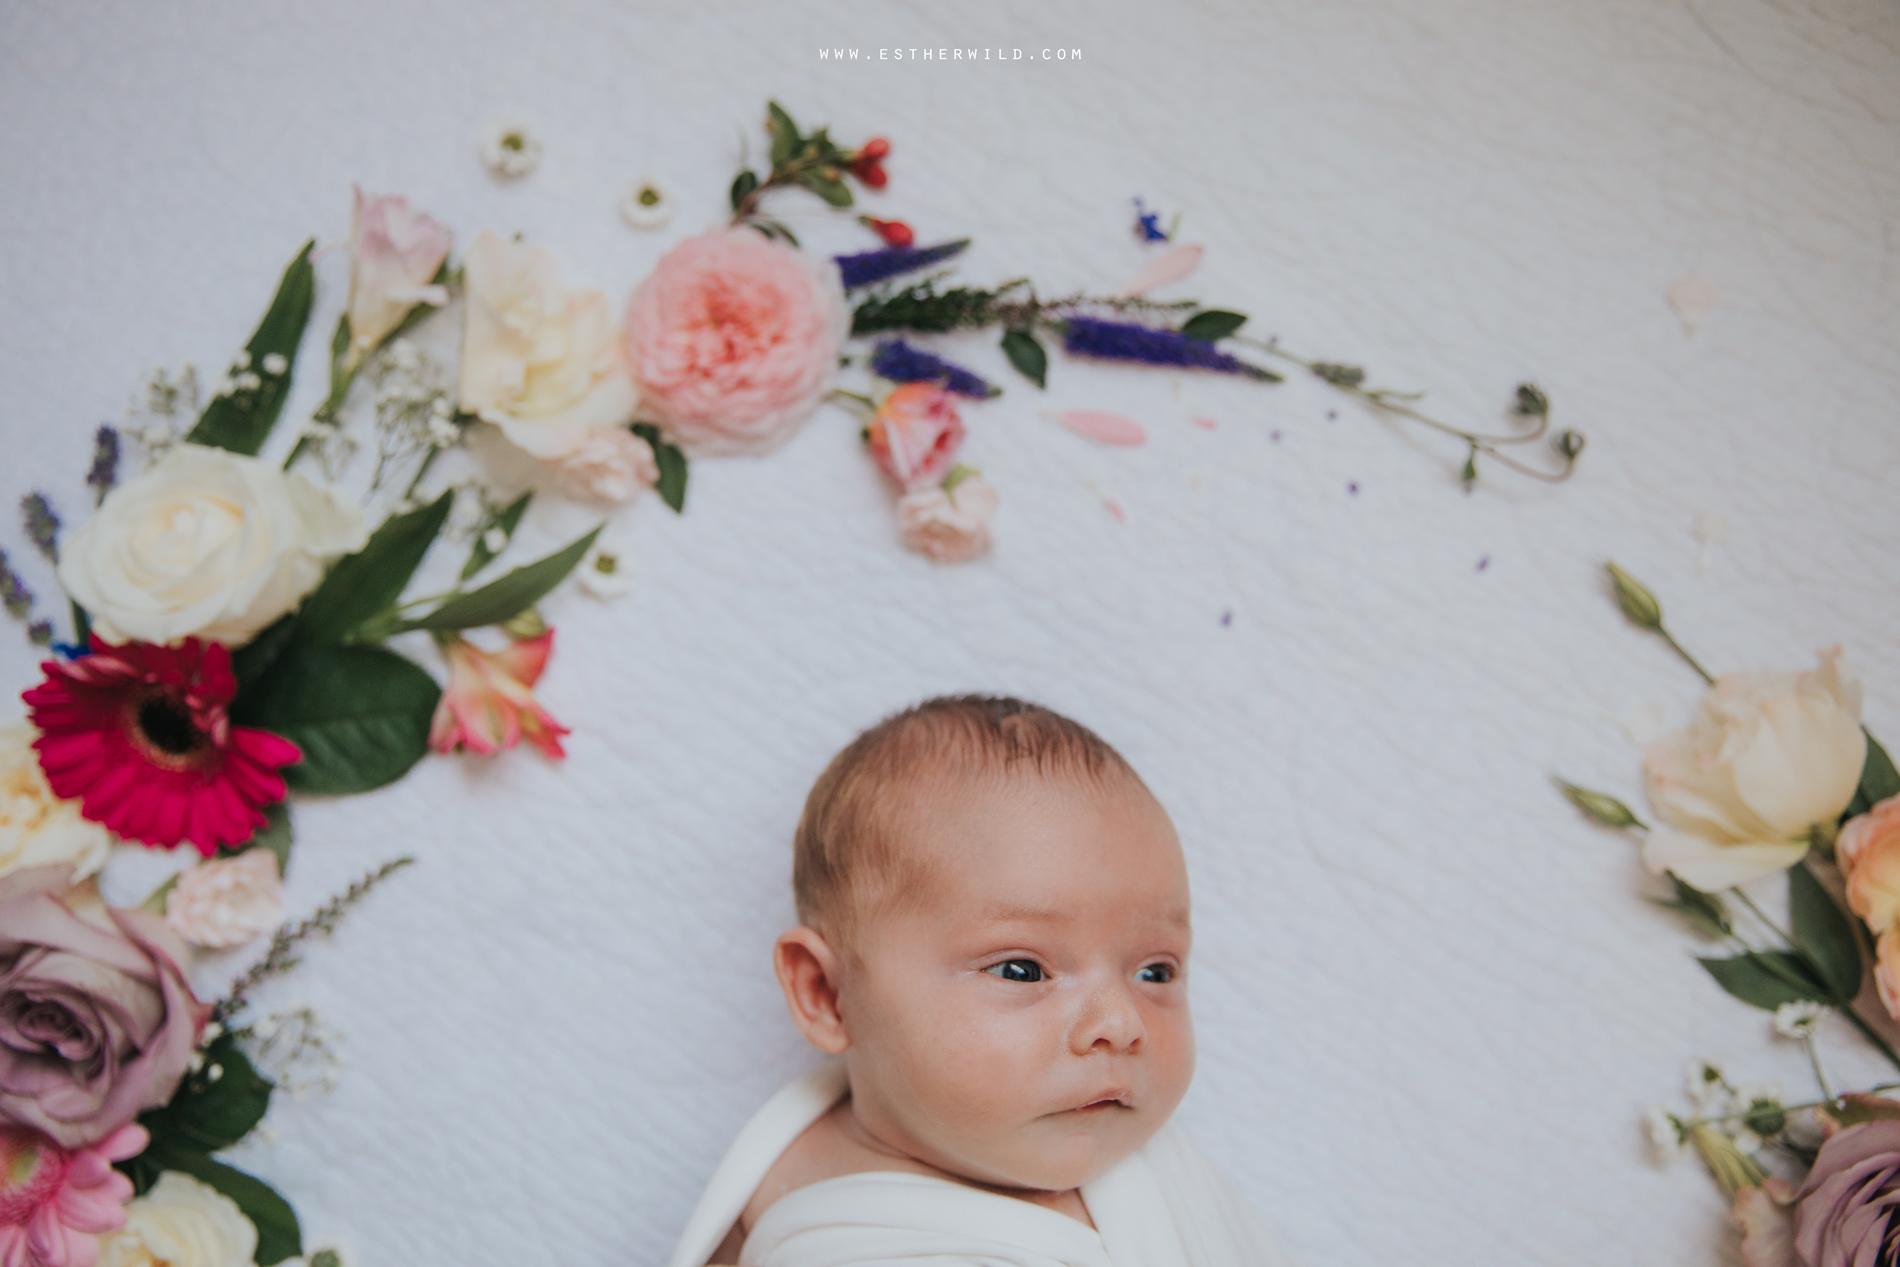 Newborn_Family_Photographer_Home_Norfolk_3R8A3822.jpg